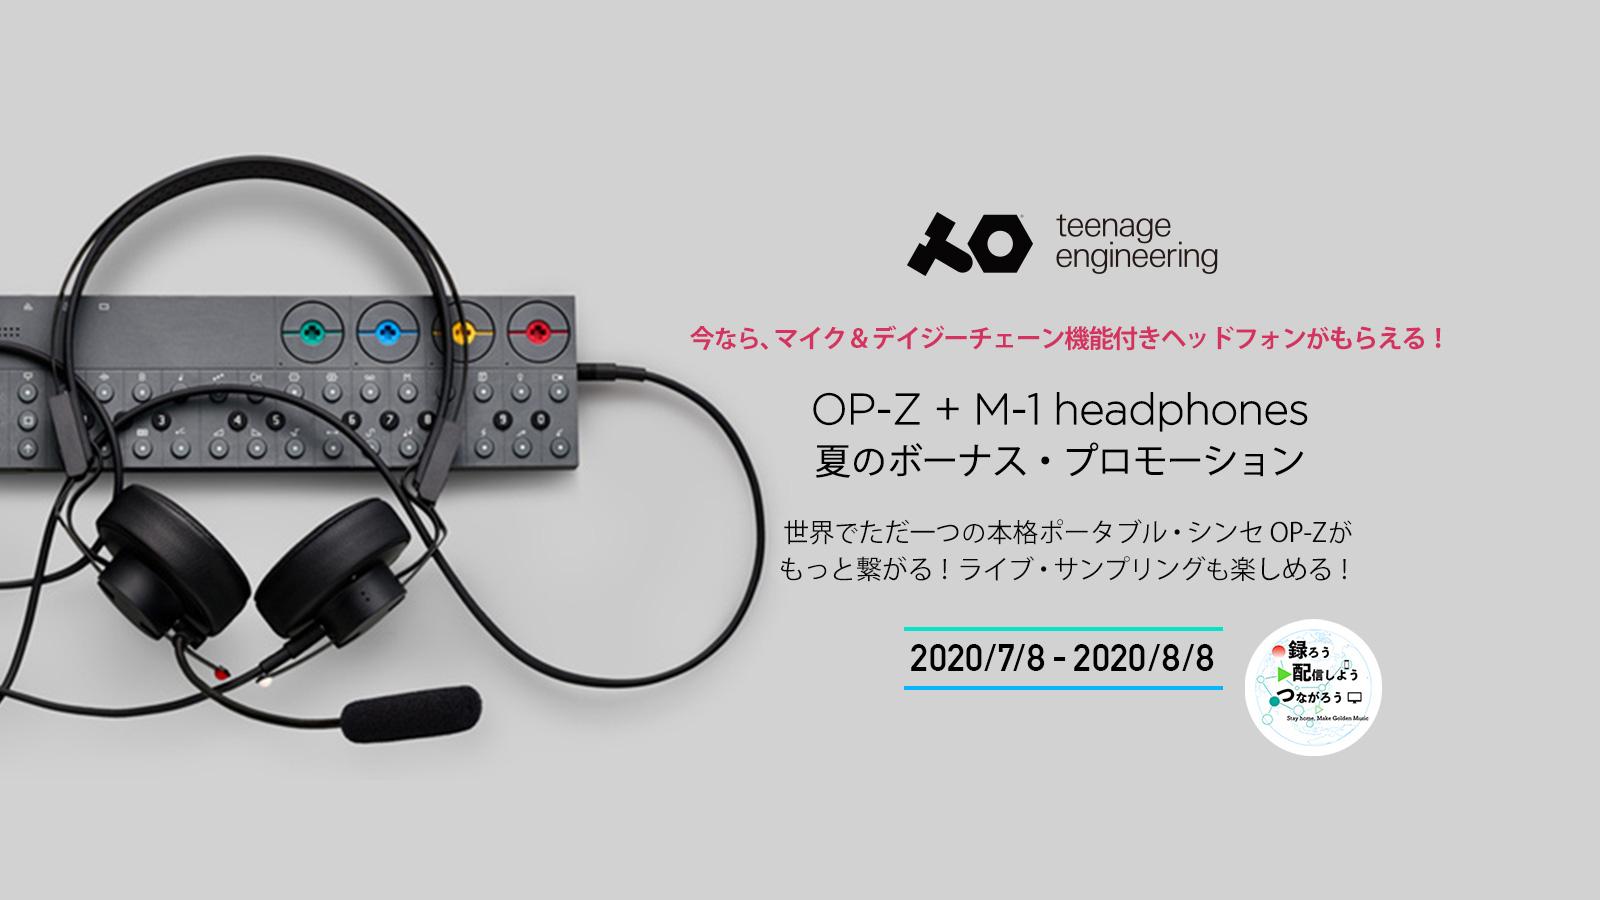 teenage engineering 純正ヘッドセットがもらえる!OP-Z +M-1 headphonesプロモーション